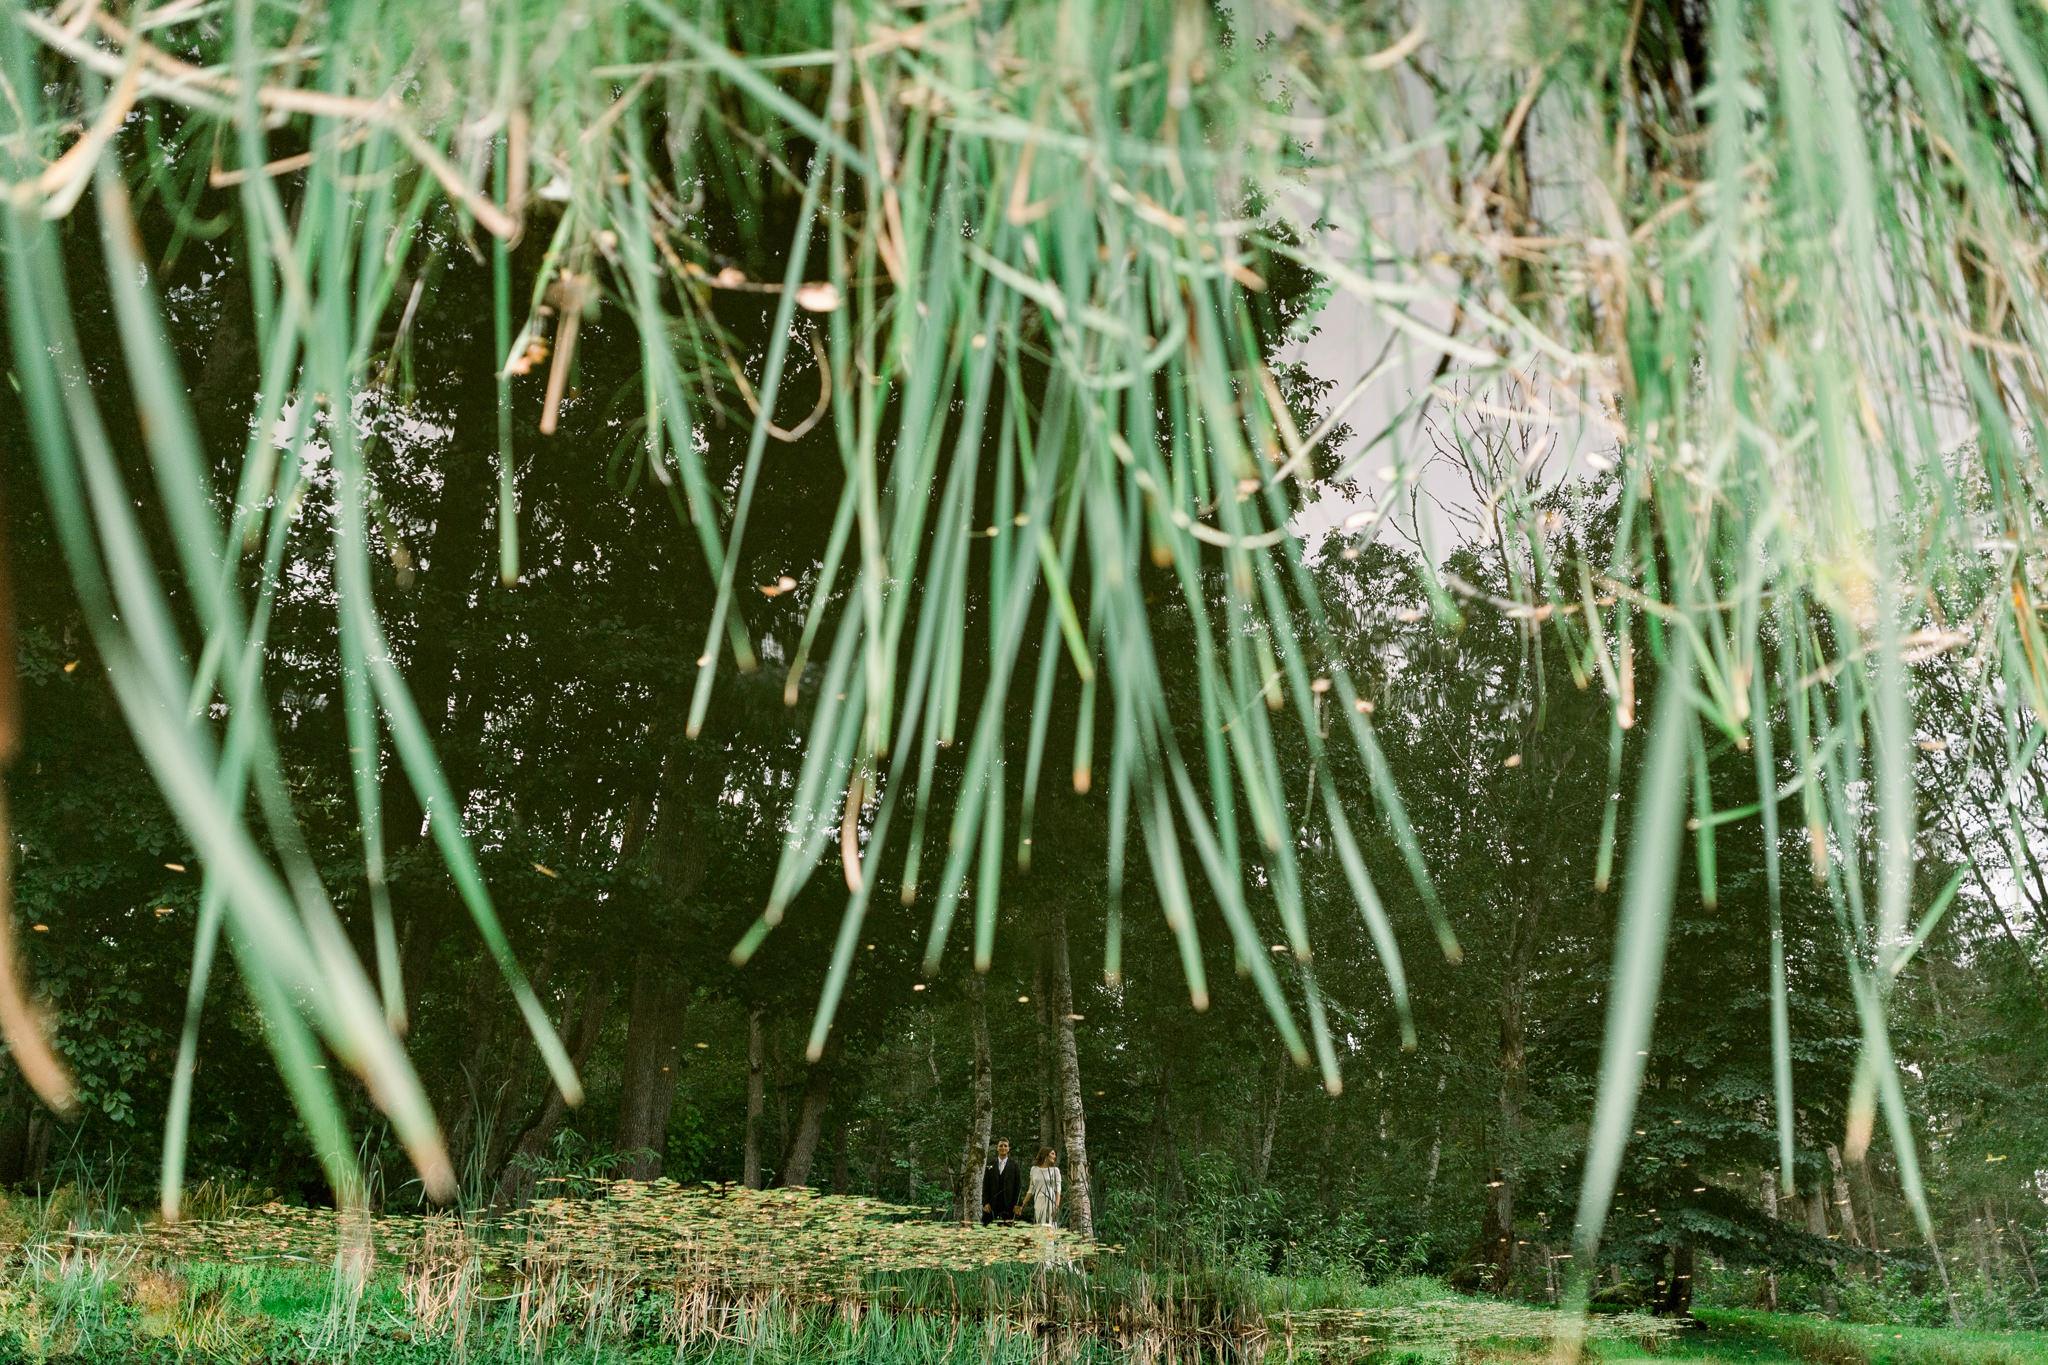 eesti-parim-pulmafotograaf-koue-mois-mait-juriado-mj-studios